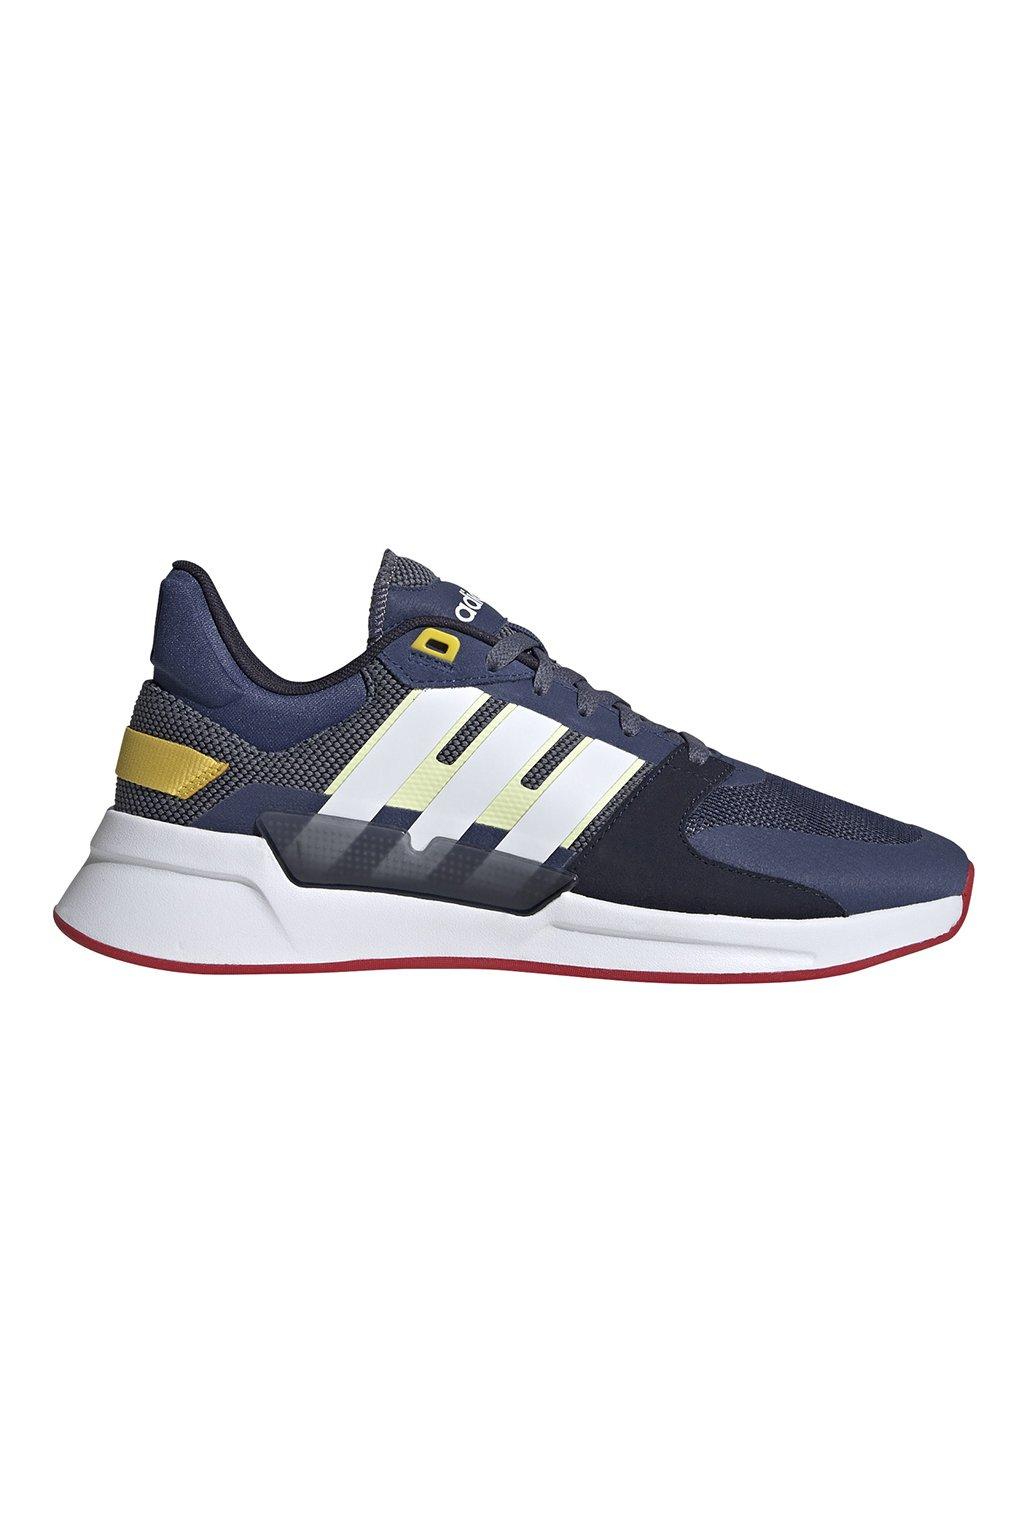 Pánske tenisky Adidas Run60S modro-biele EG8656